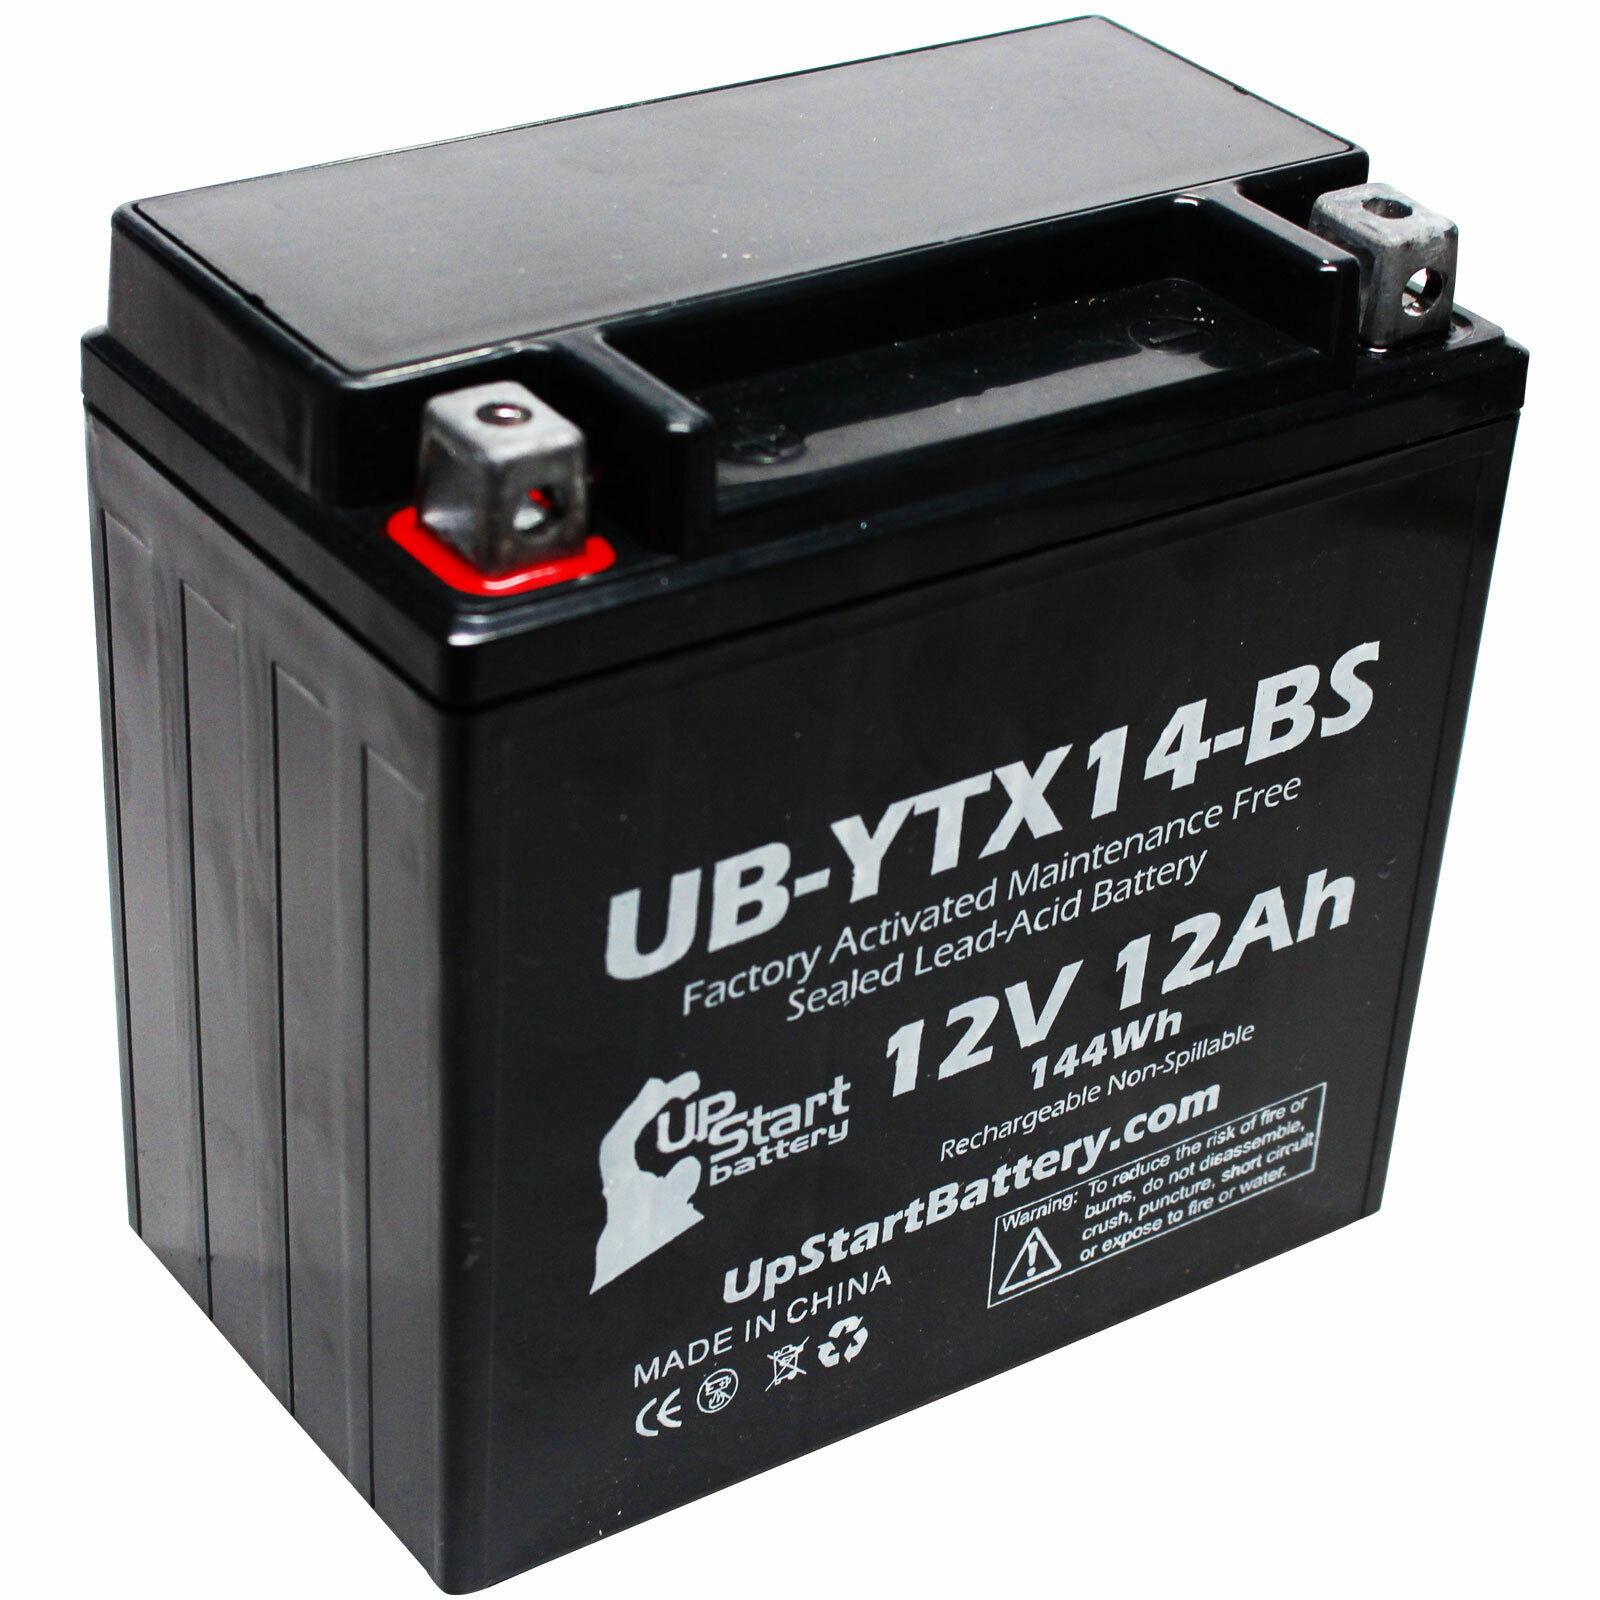 12V 12AH Battery for 1999 Honda TRX300 Fourtrax 300 CC